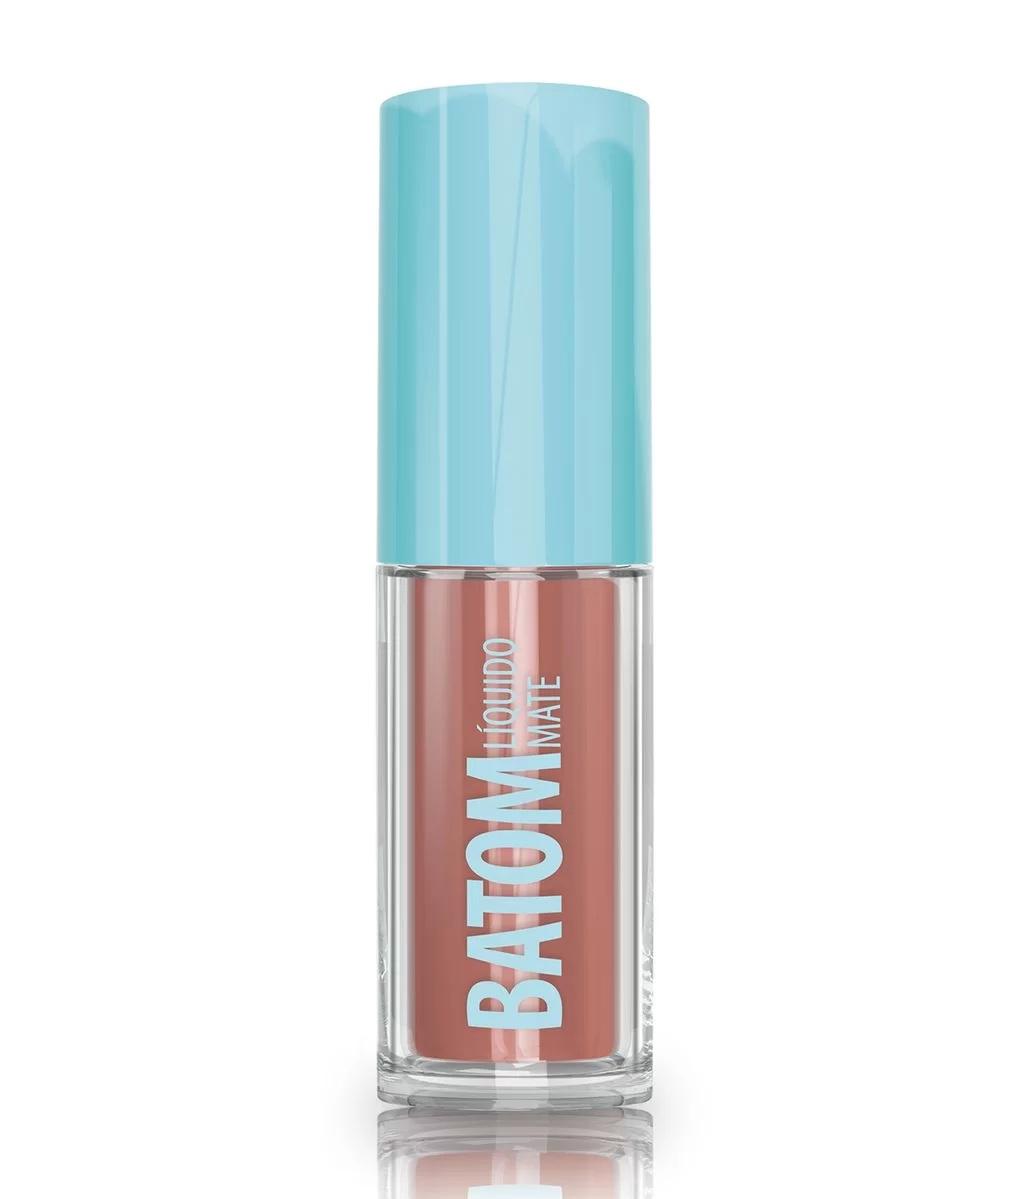 Batom Liquido Mate Cor Segunda - 4g -  Boca Rosa Beauty